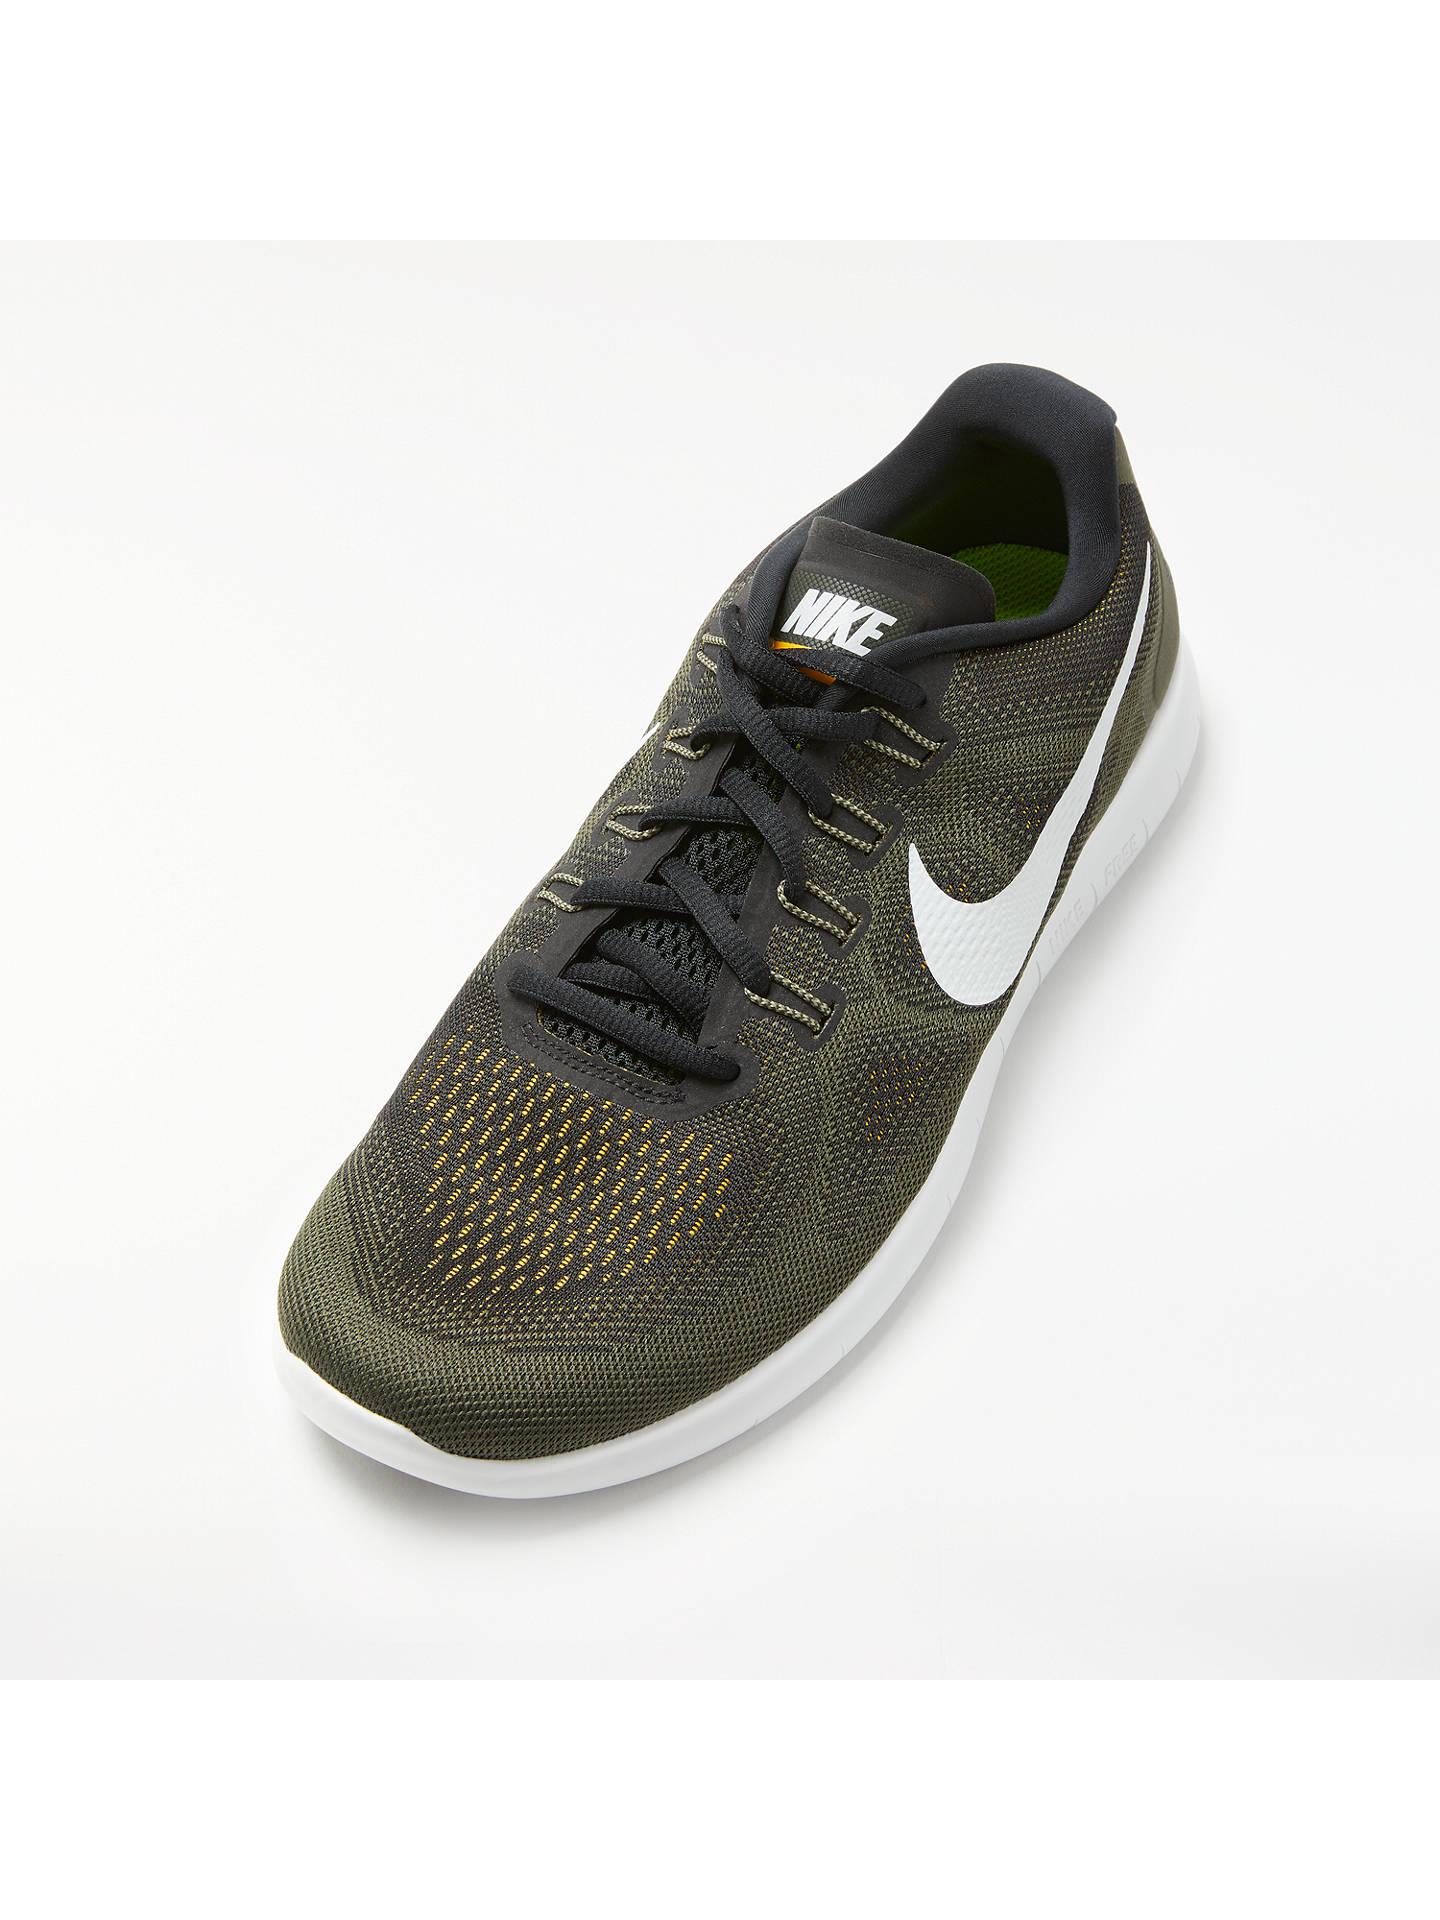 e4bf8bc8b375c ... Buy Nike Free RN 2017 Men s Running Shoe